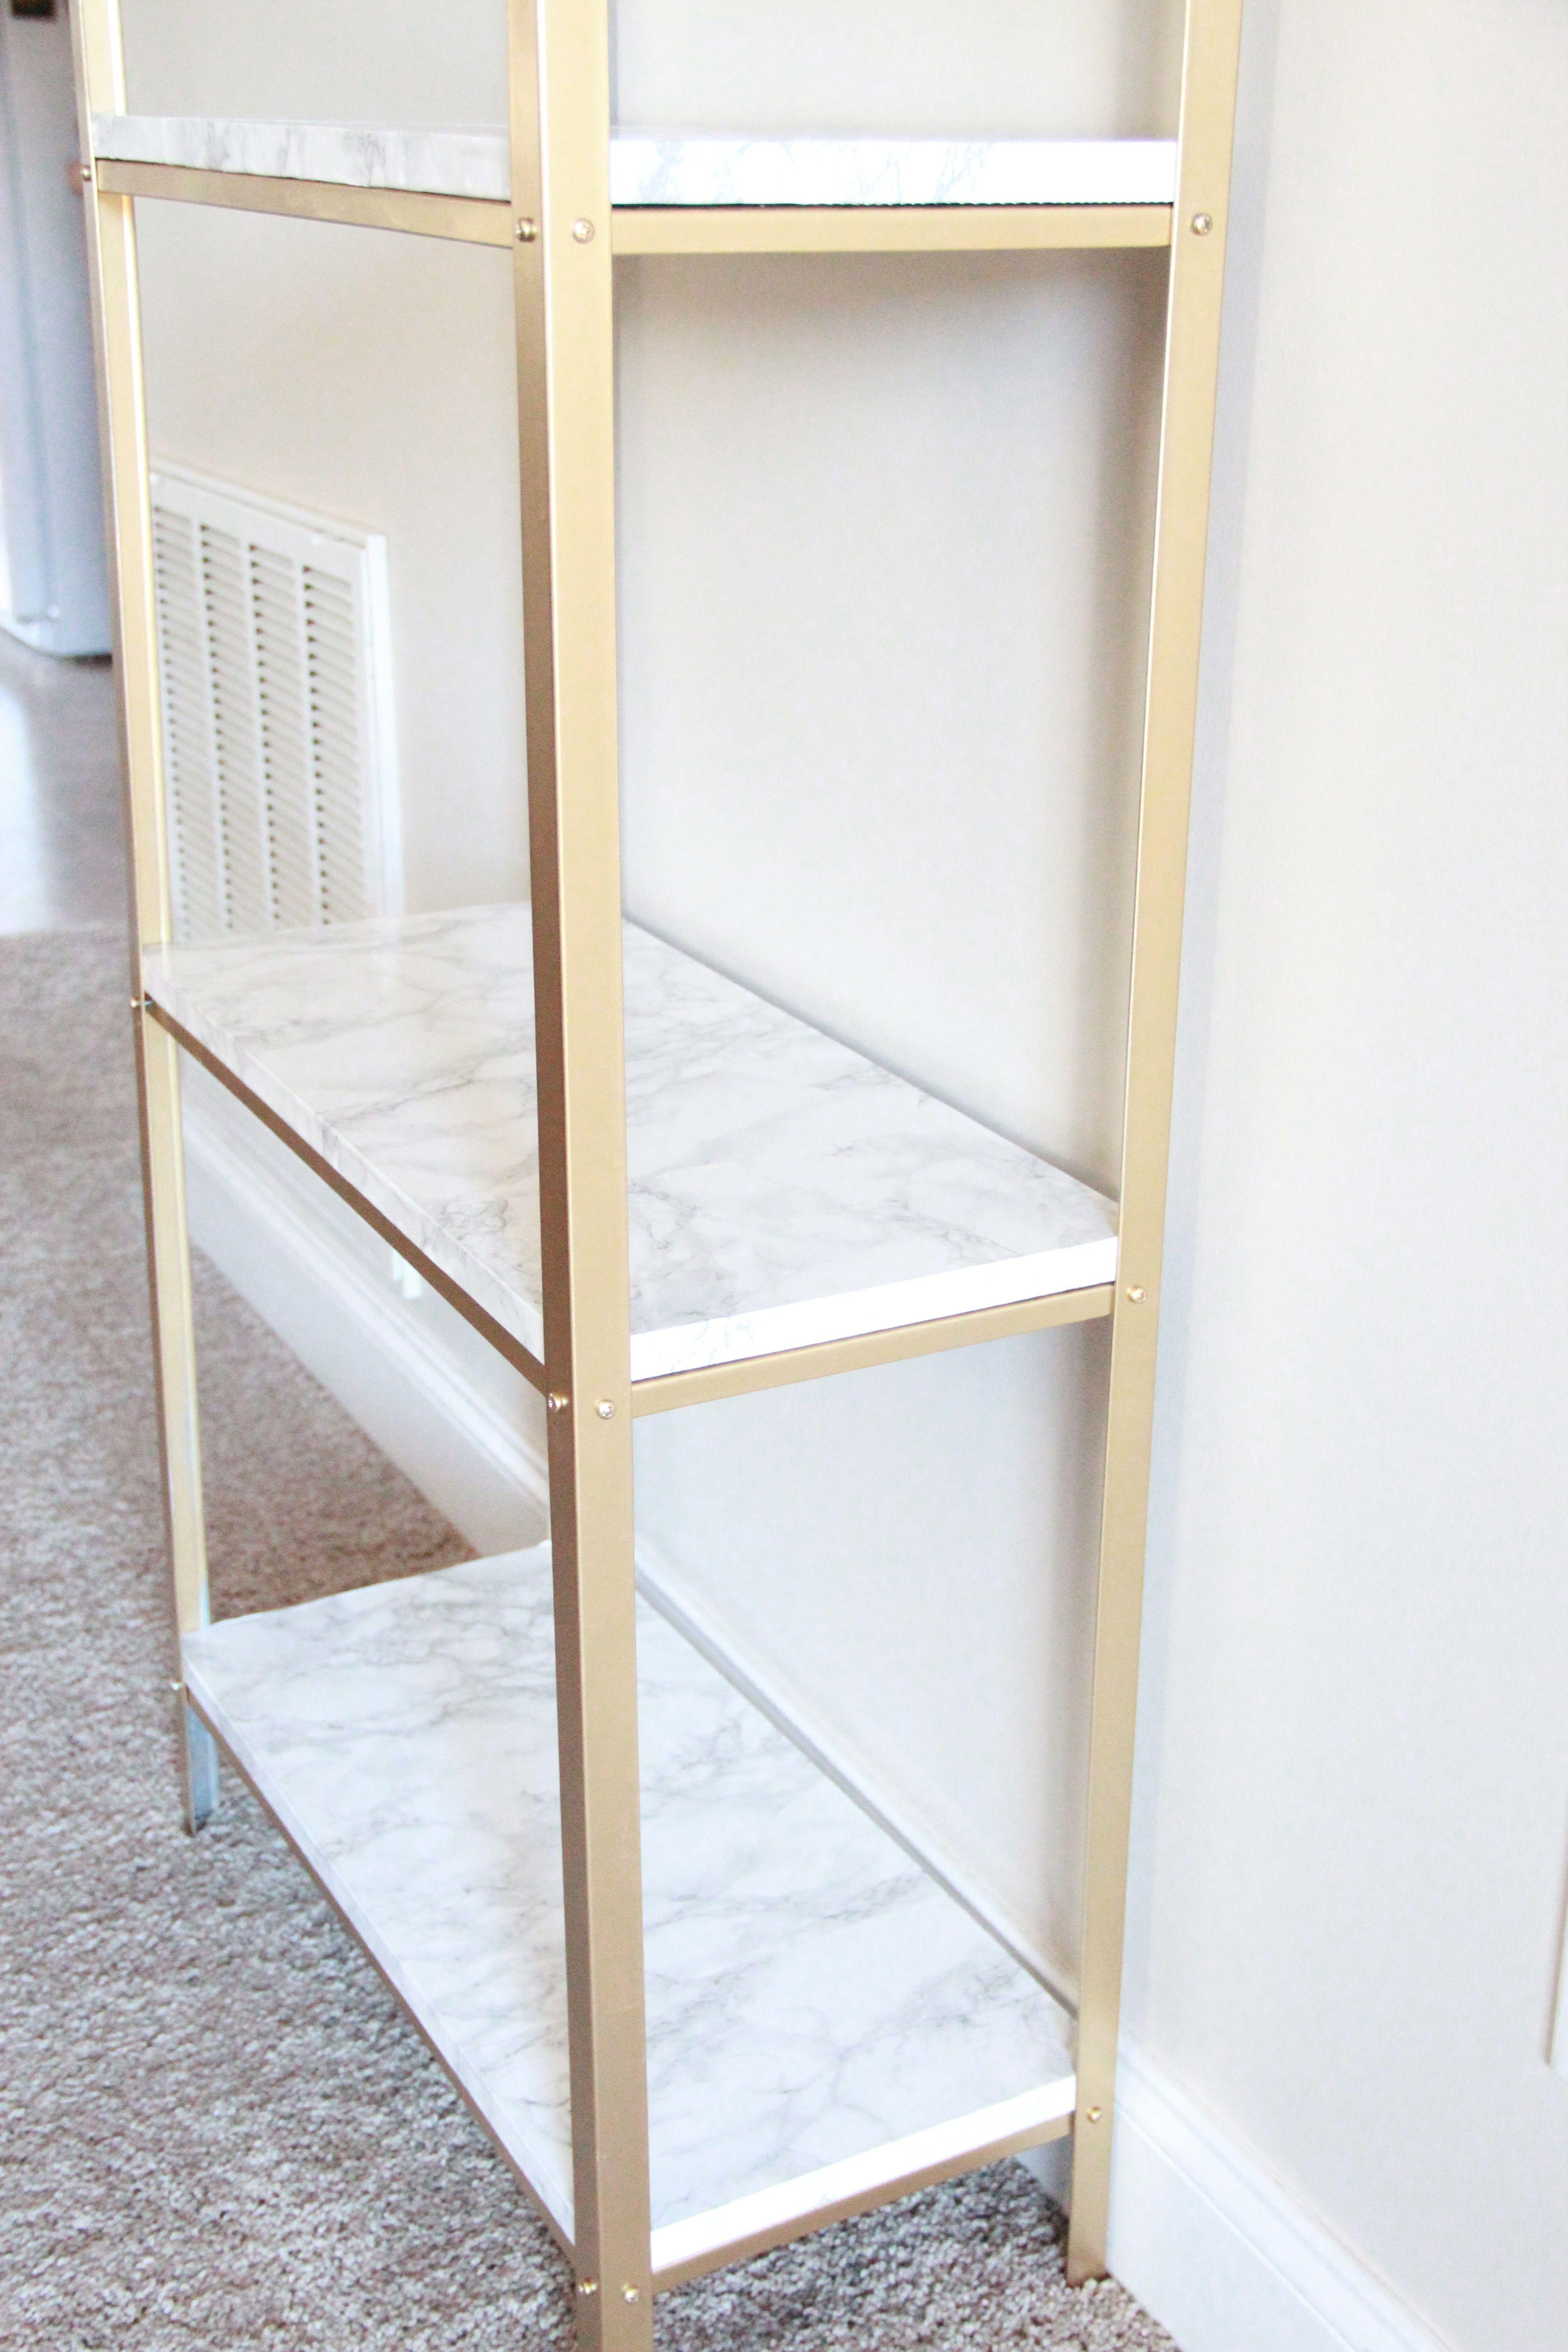 Ikea Hack Wood And Metal Bookshelf Diy Home Decor Projects Diy